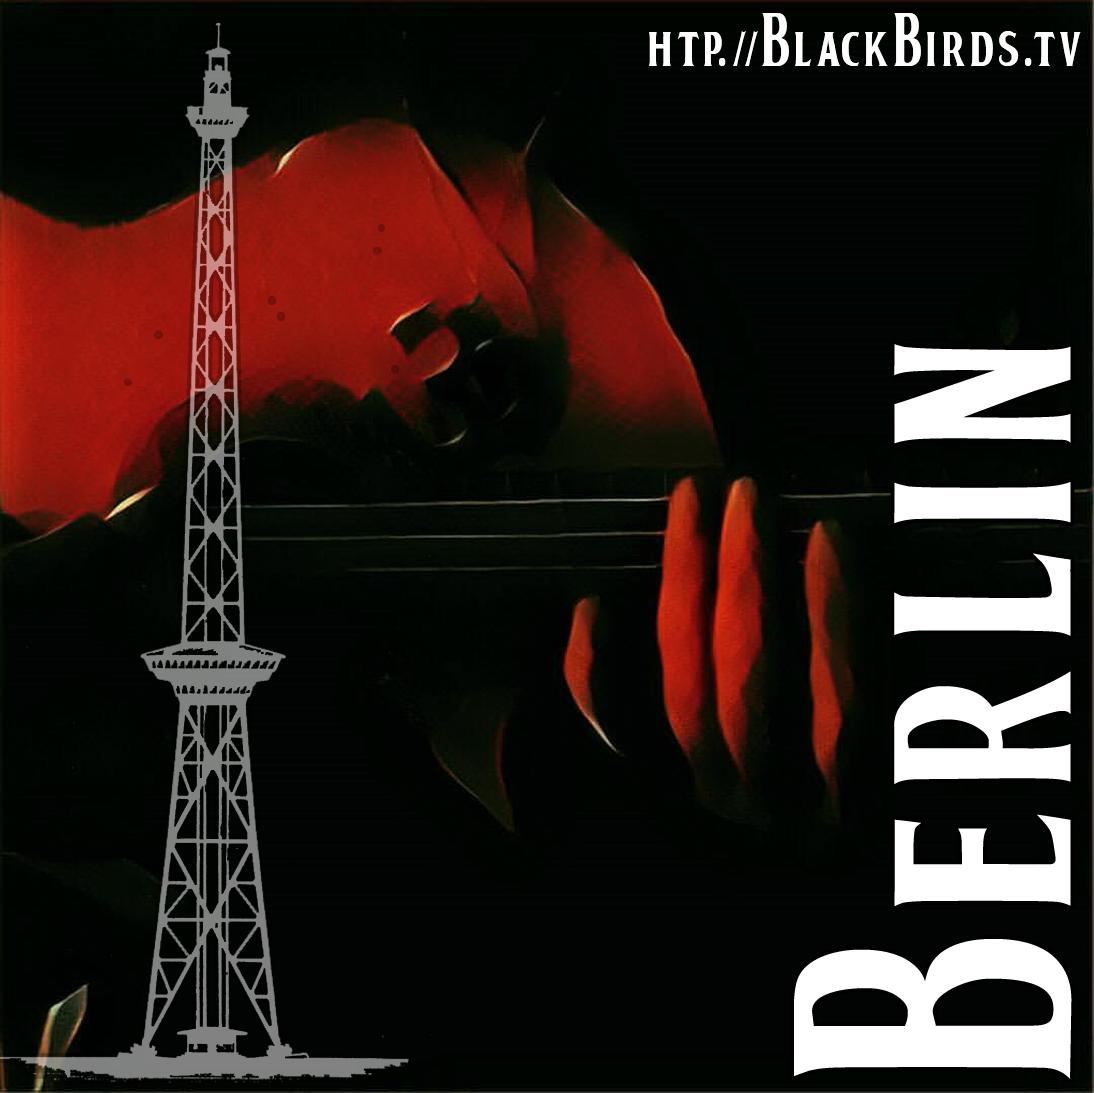 Berlin-Banner Tommy Tulip, genannt Truelip